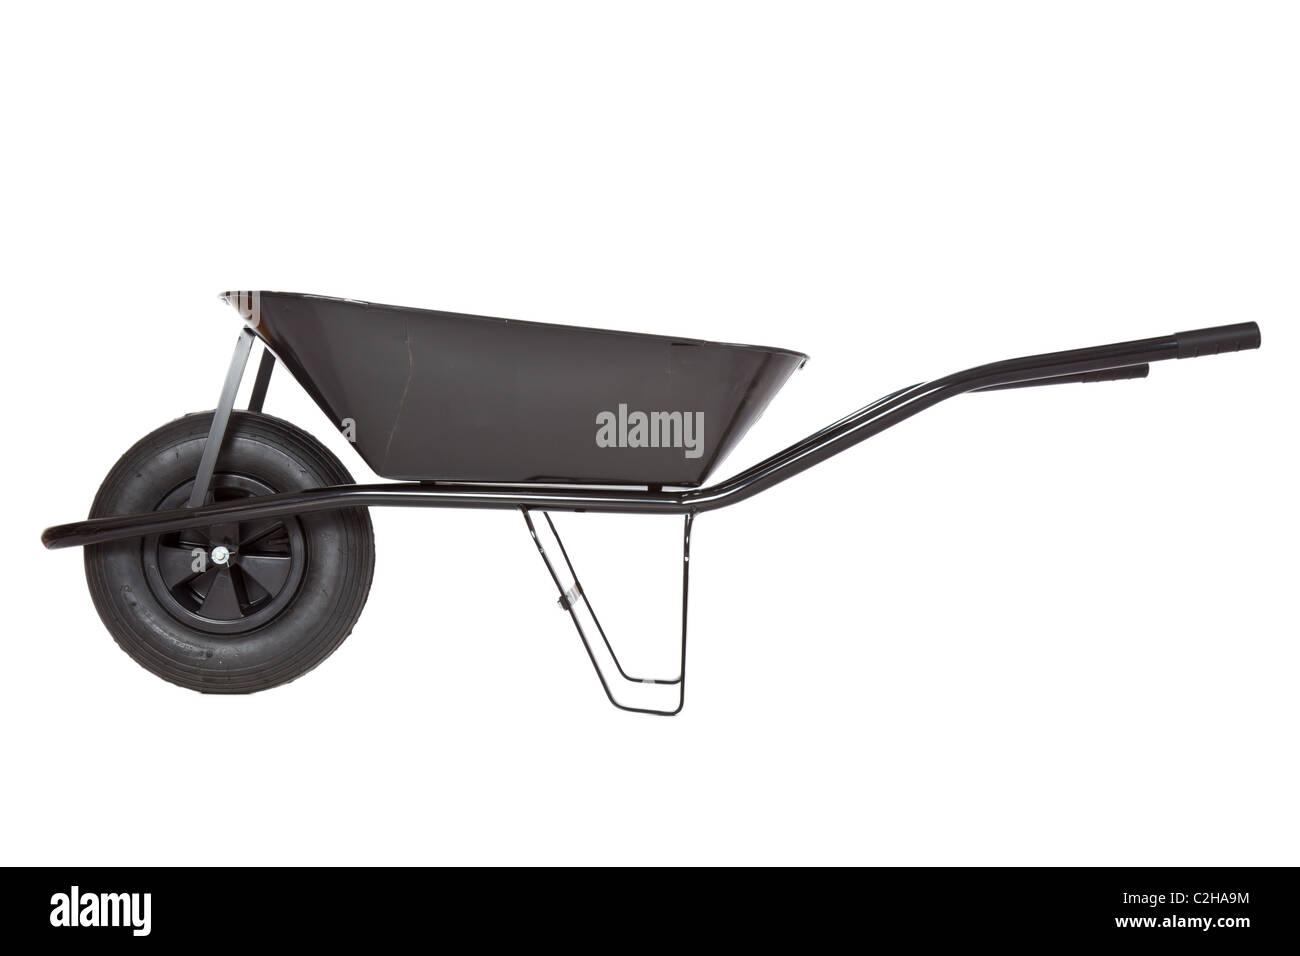 black wheelbarrow on white background - Stock Image